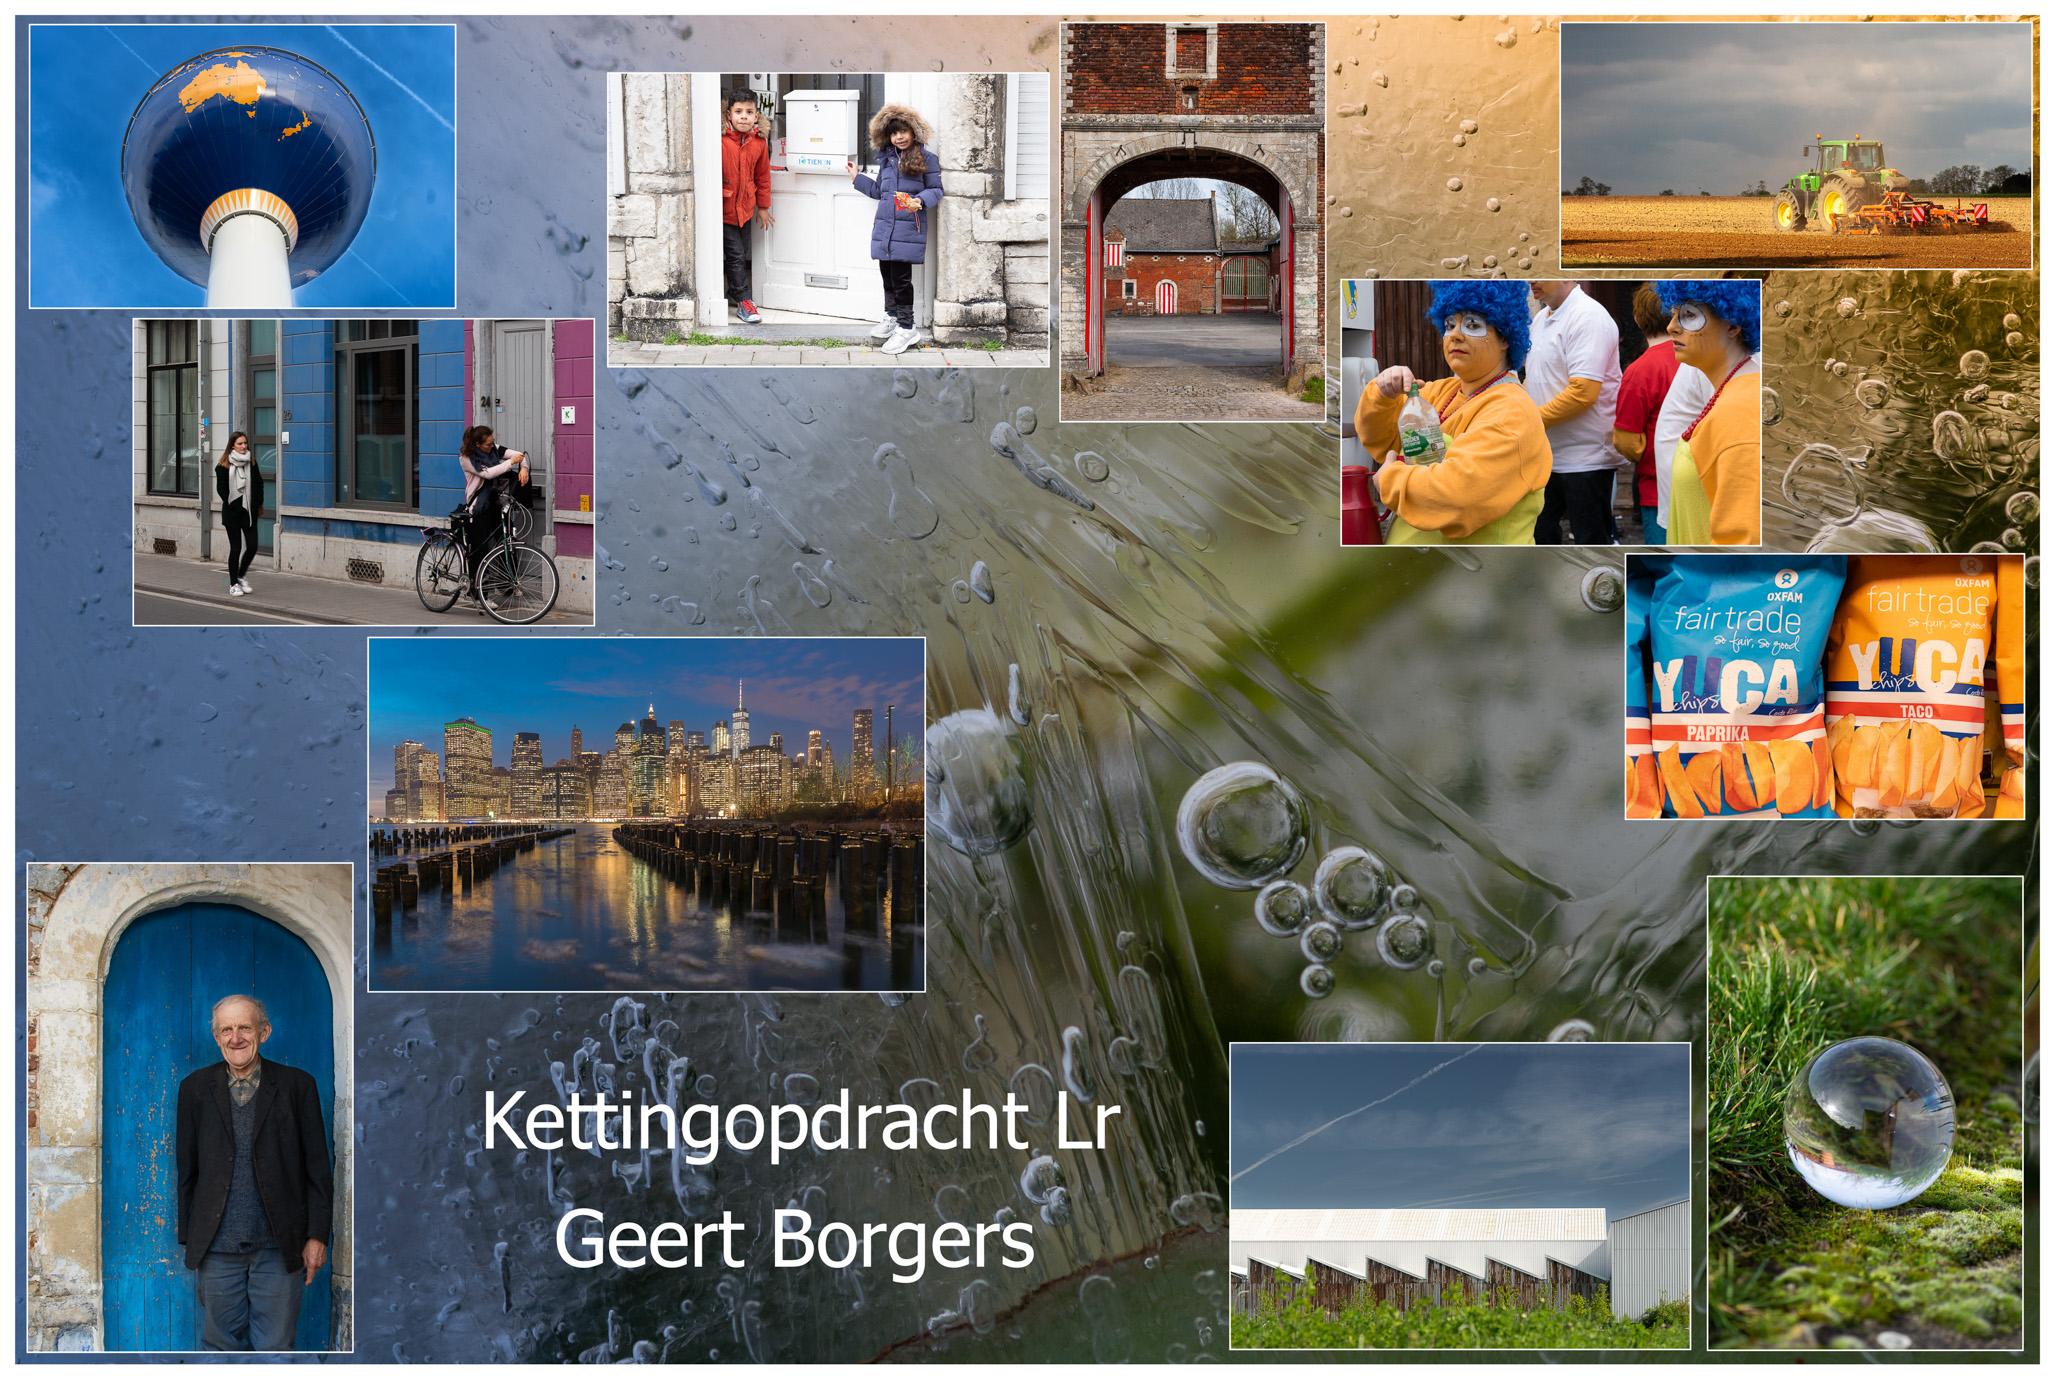 Geert Borgers - kettingopdracht